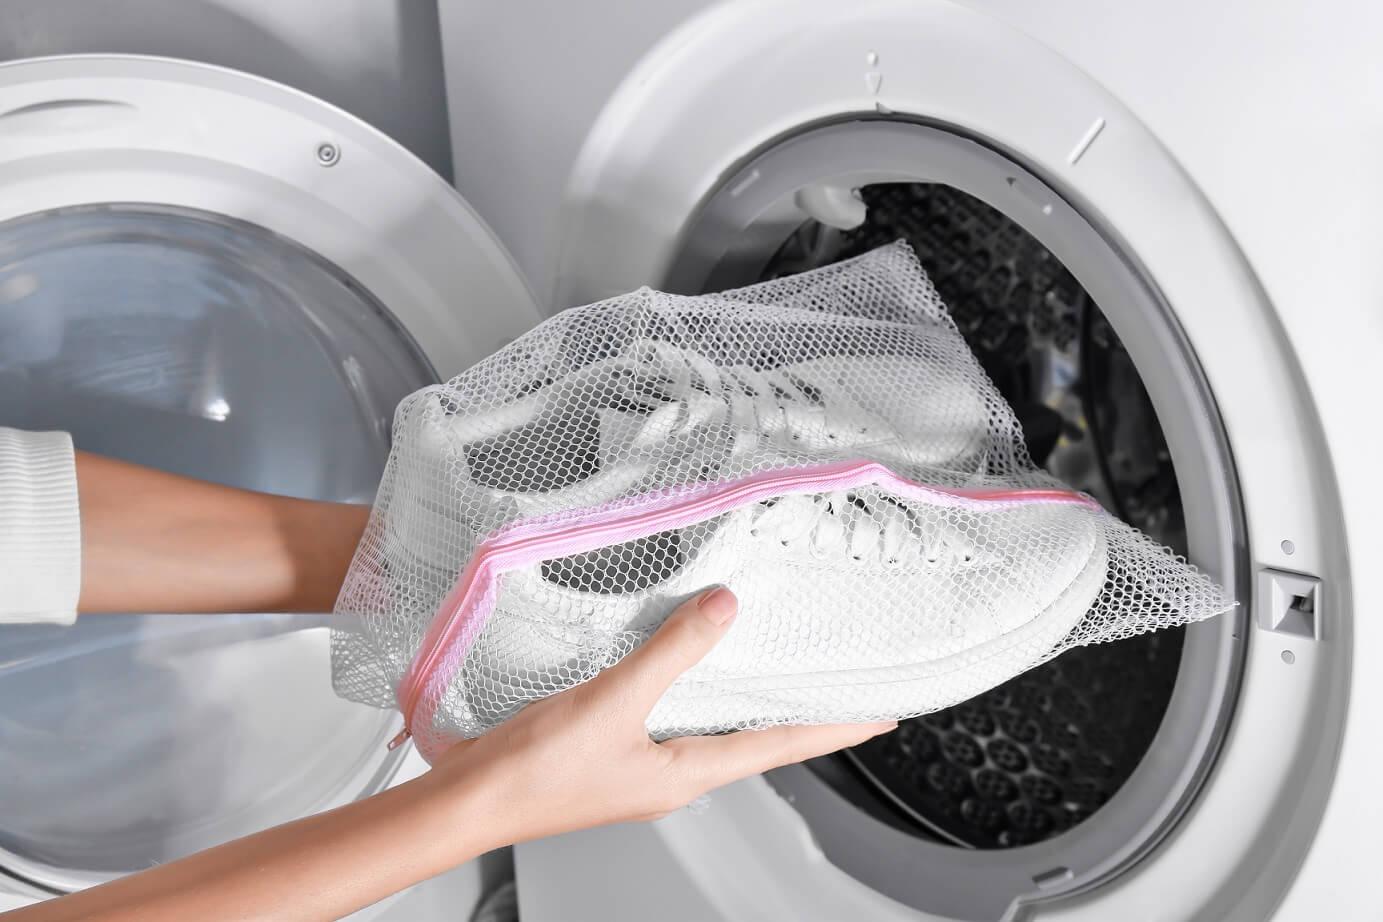 praní tenisek v pračce